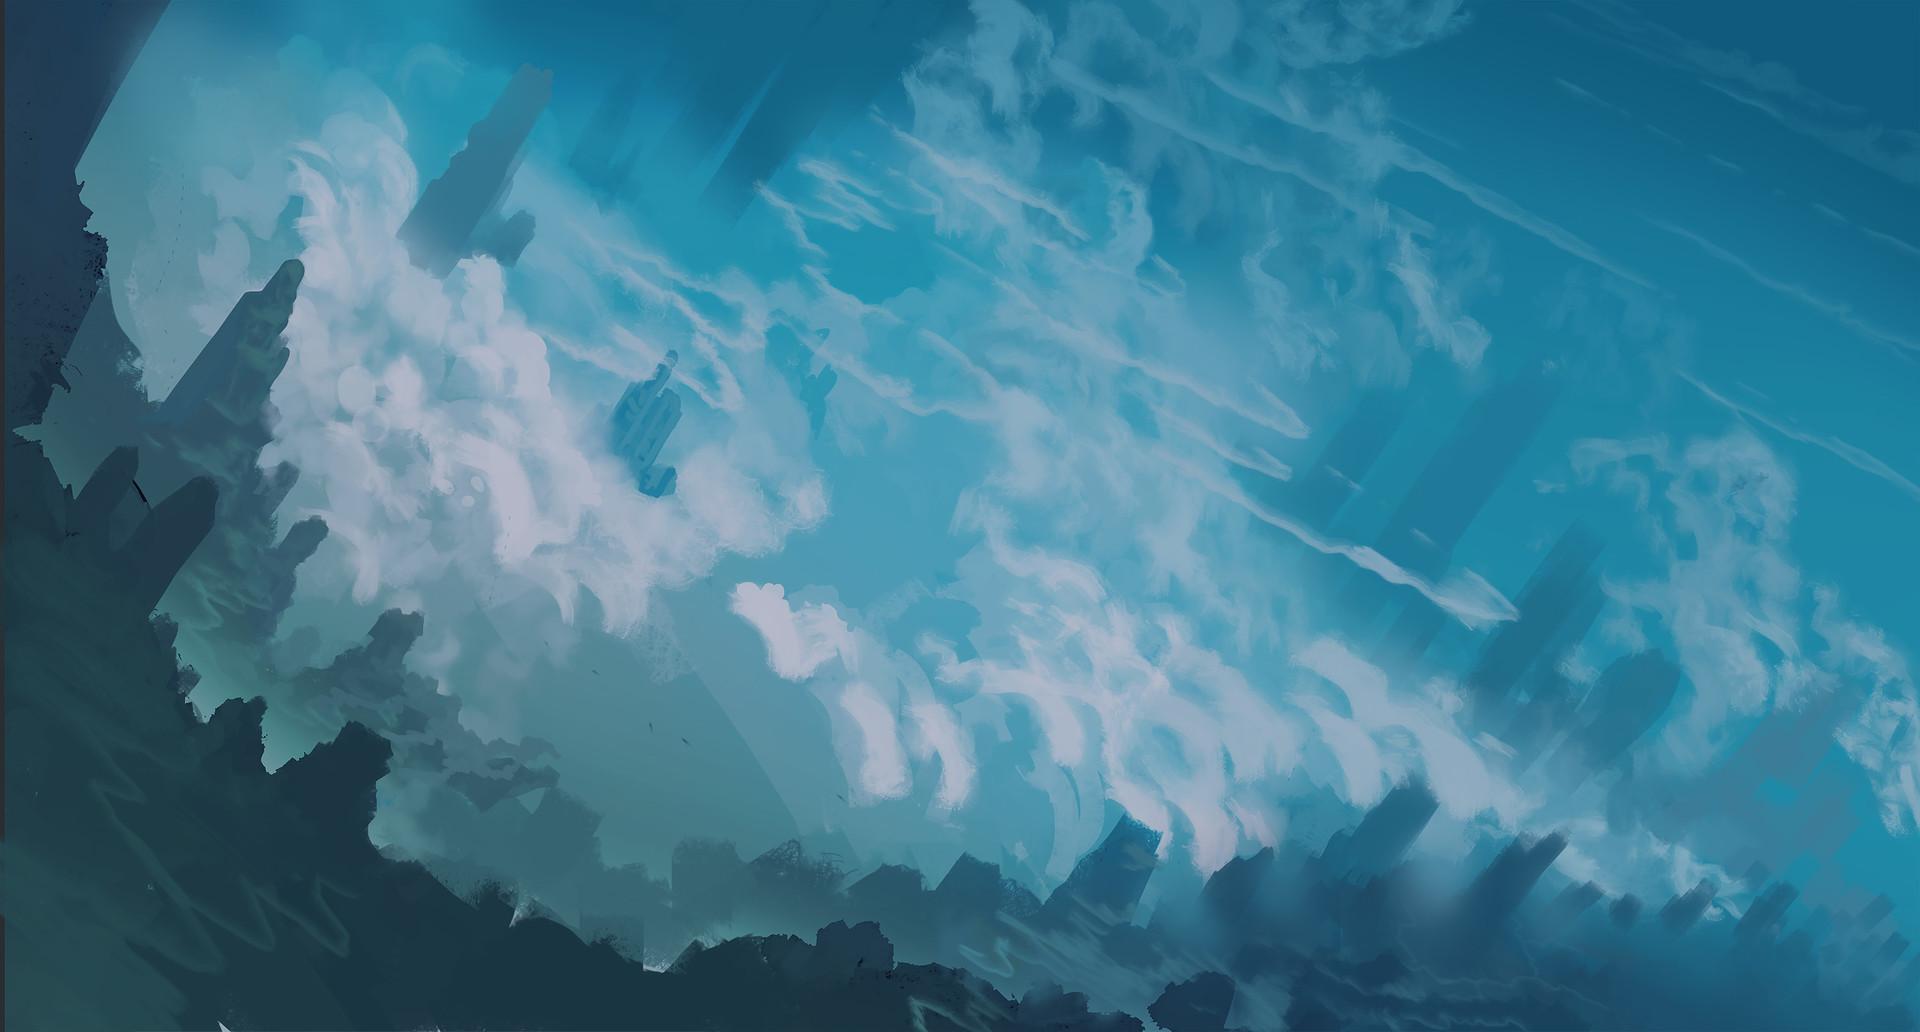 Francisco badilla floyd dragon sketch bueno 2